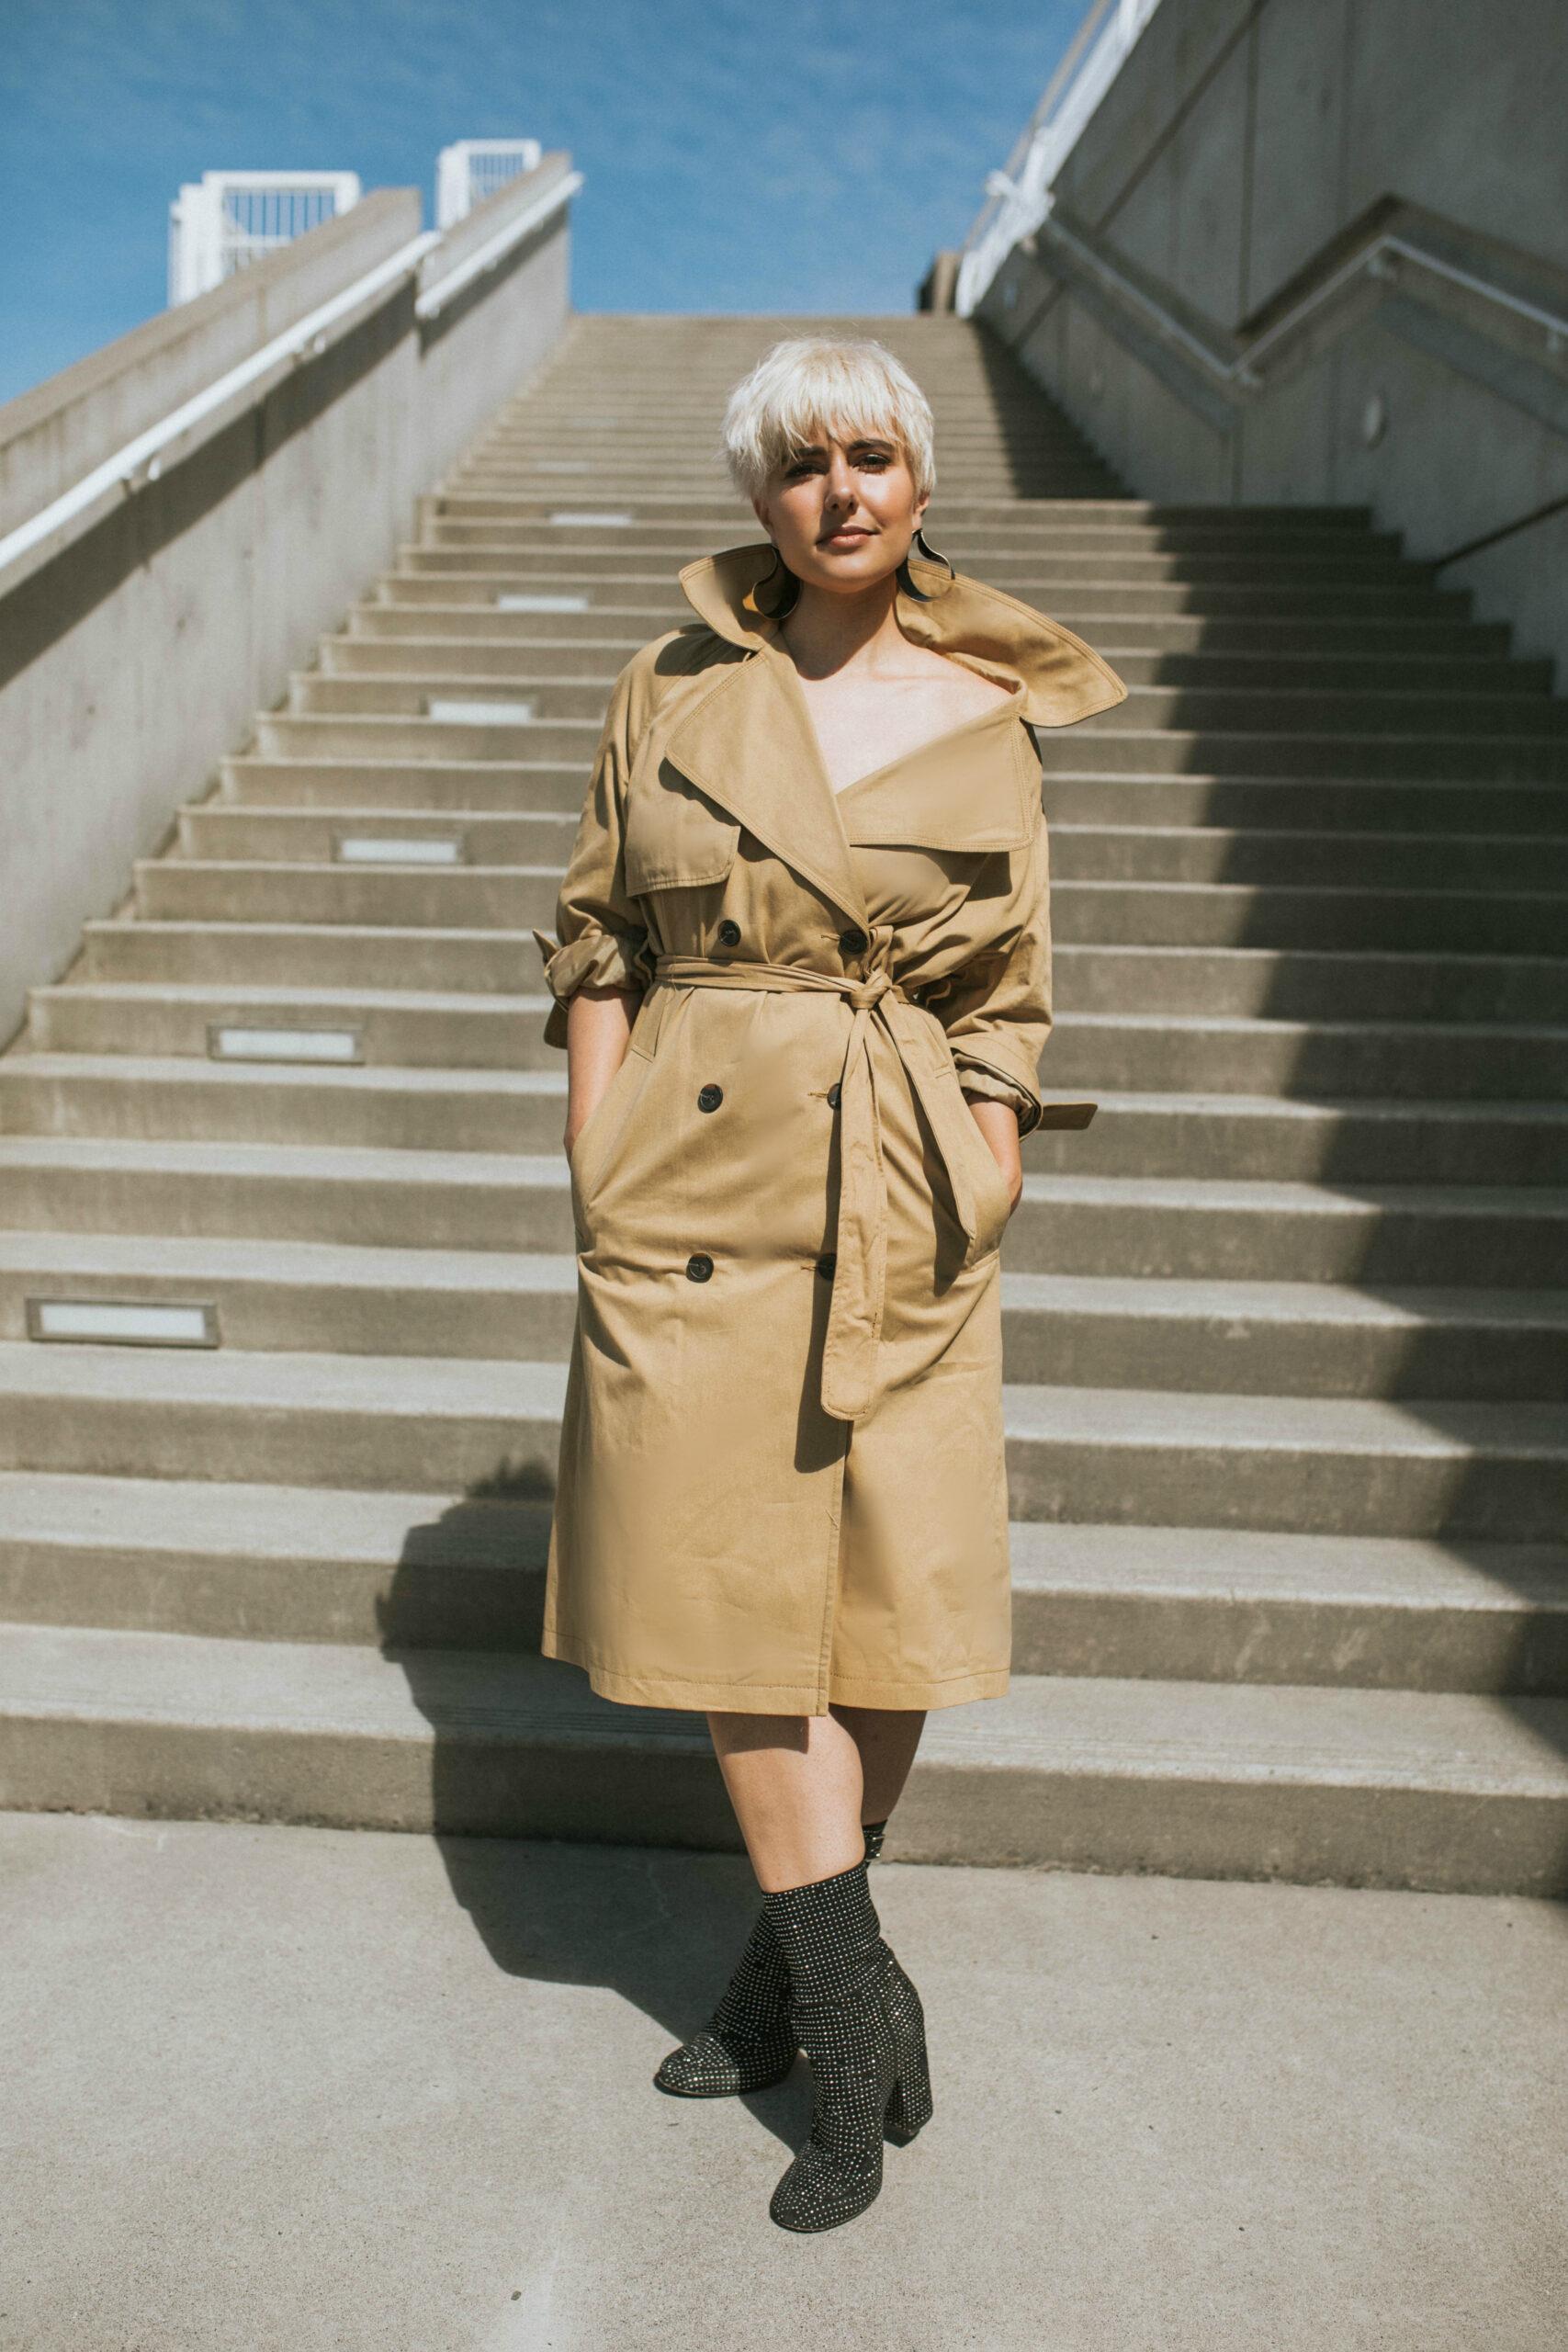 Recreating Priyanka Chopra's Met Gala 2017 Trench Coat Dress - BloggerNotBillionaire.com